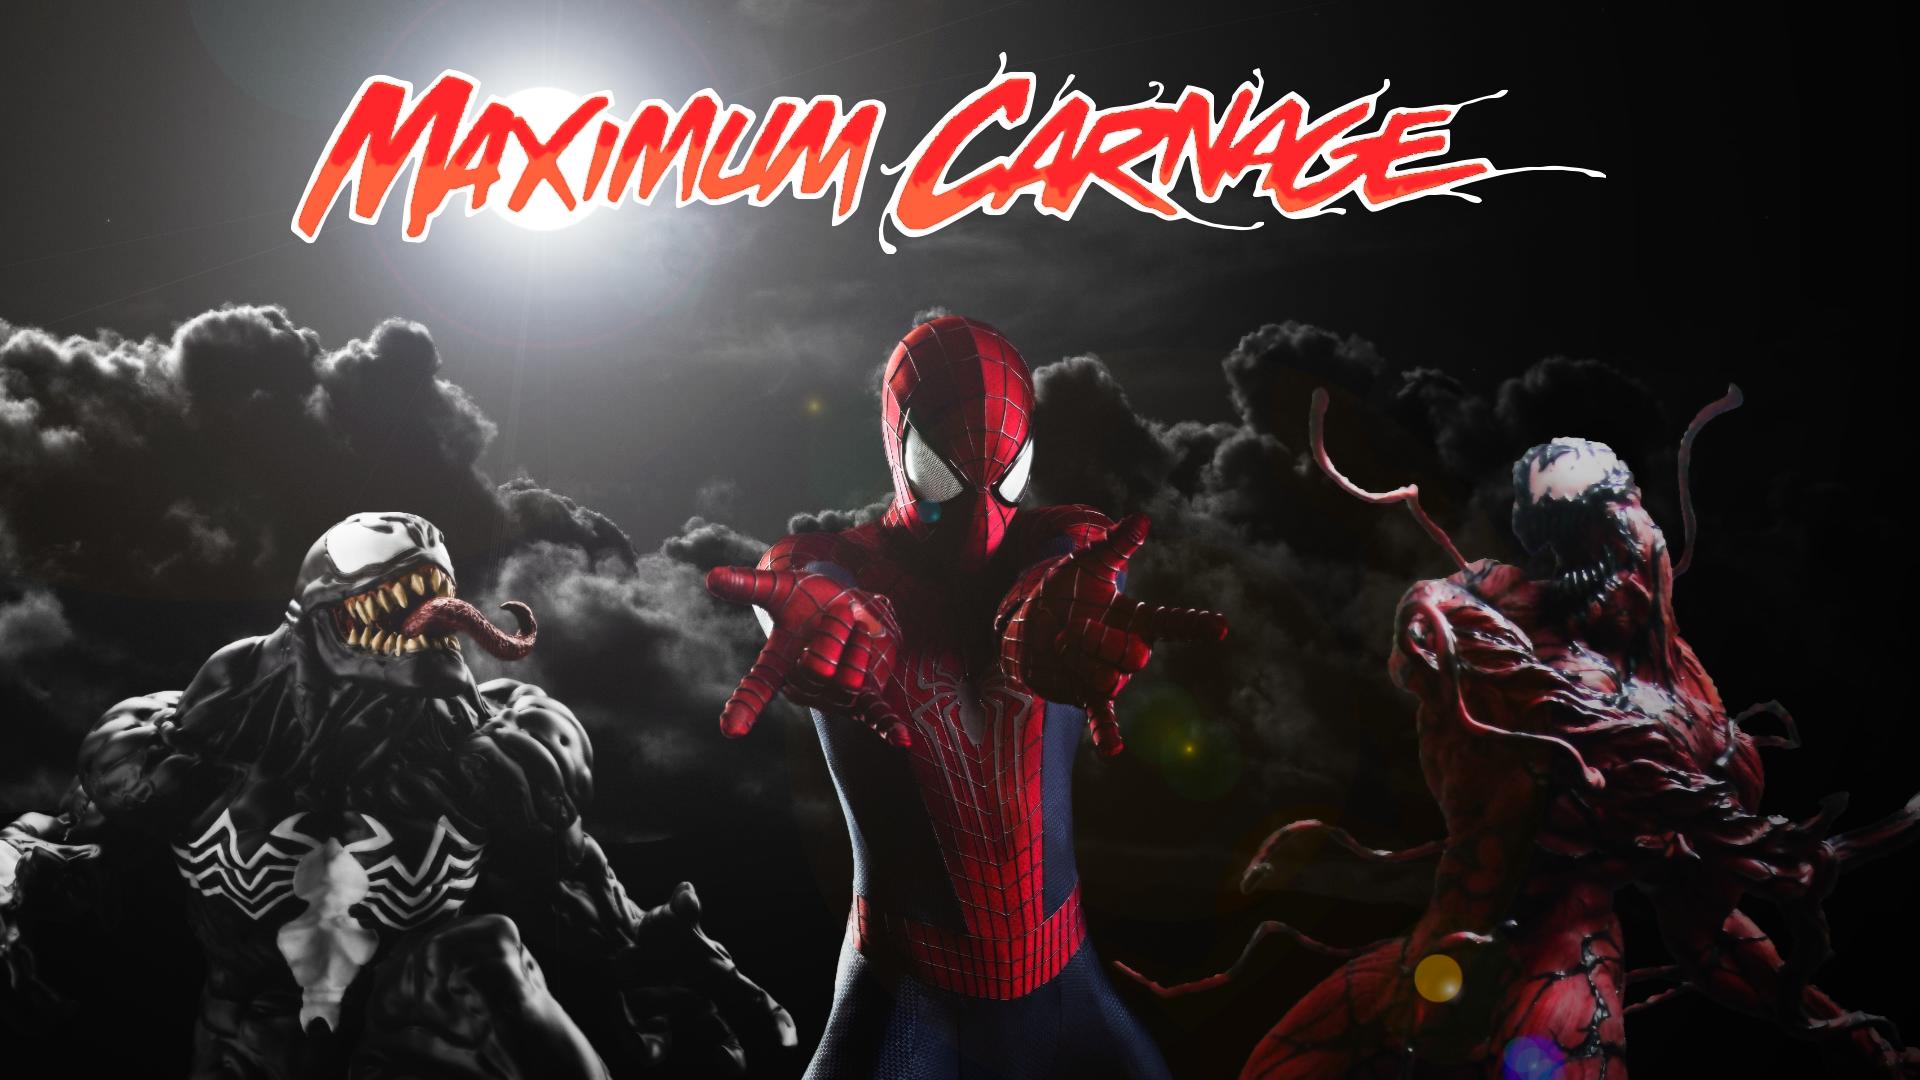 Spider Man and Venom Maximum Carnage Poster 1 by ProfessorAdagio on 1920x1080